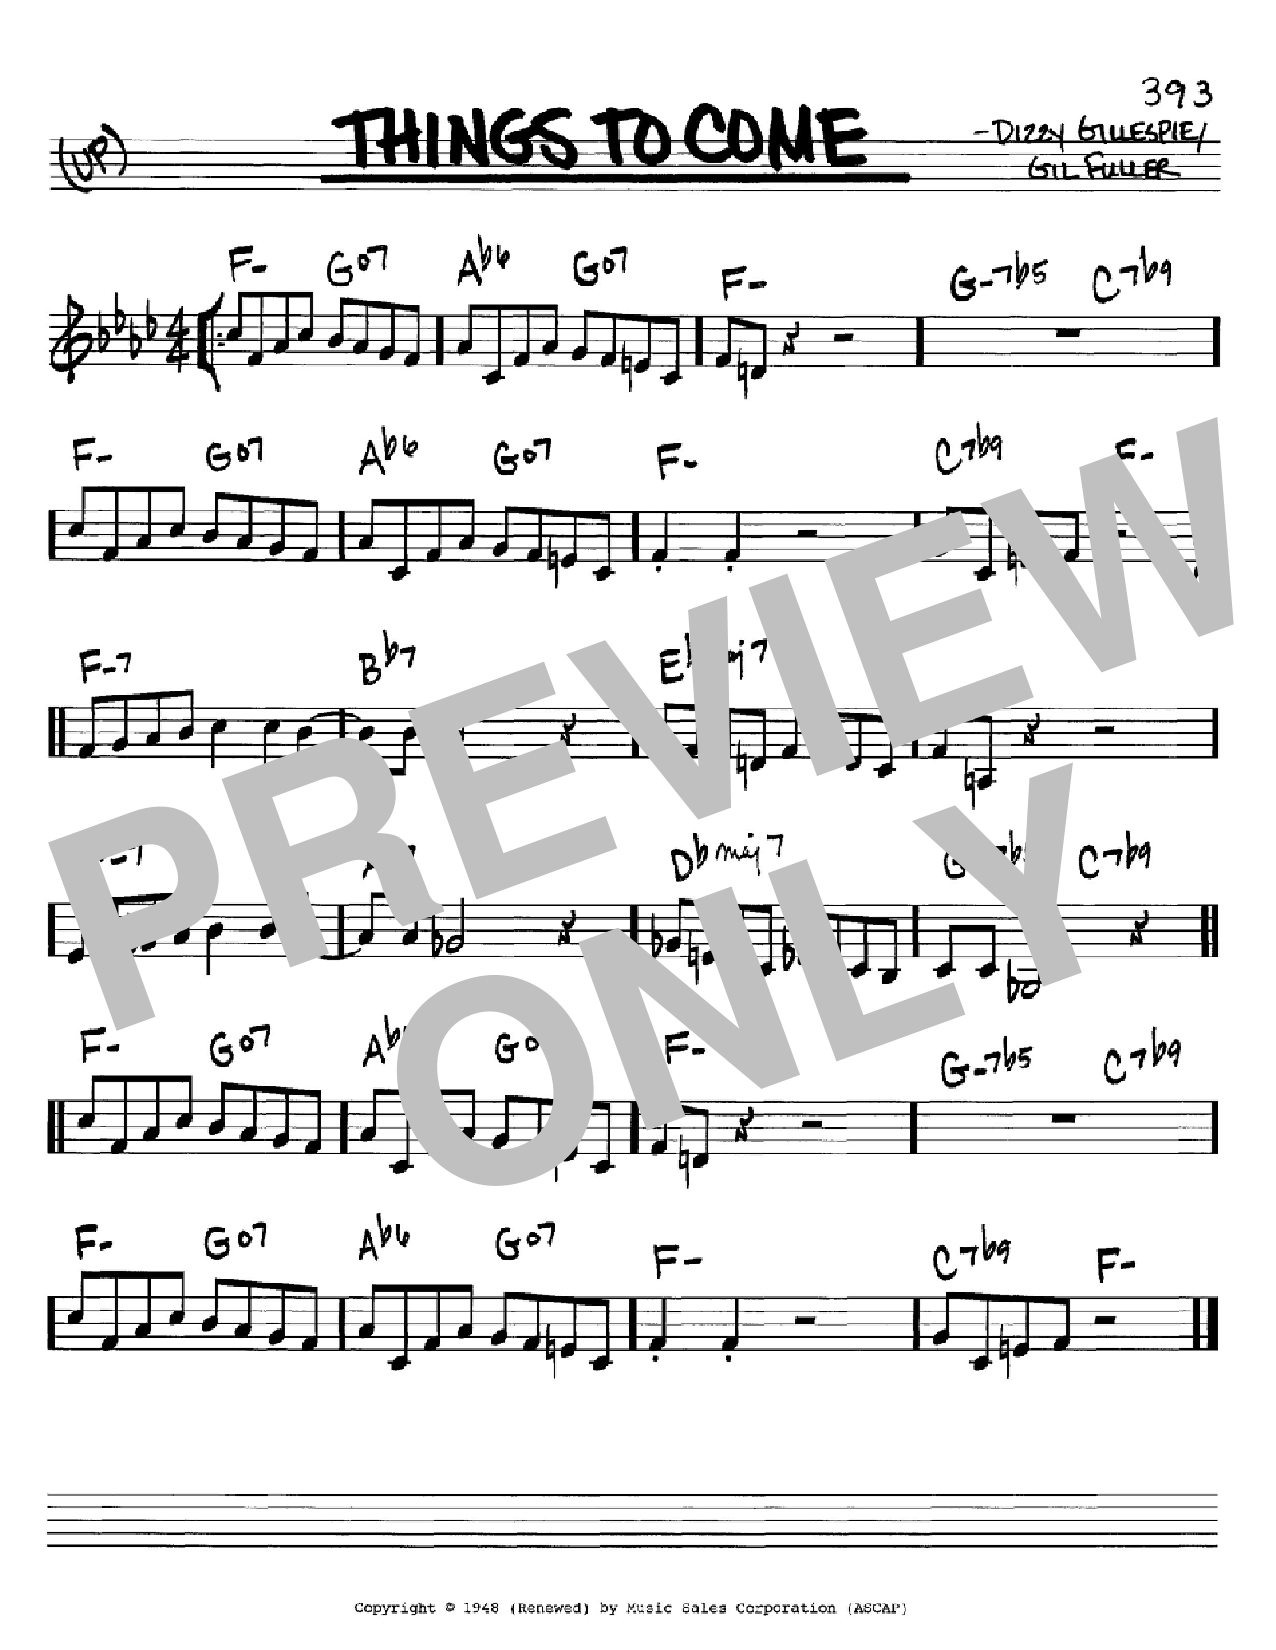 Partition autre Things To Come de Dizzy Gillespie - Real Book, Melodie et Accords, Inst. En Do